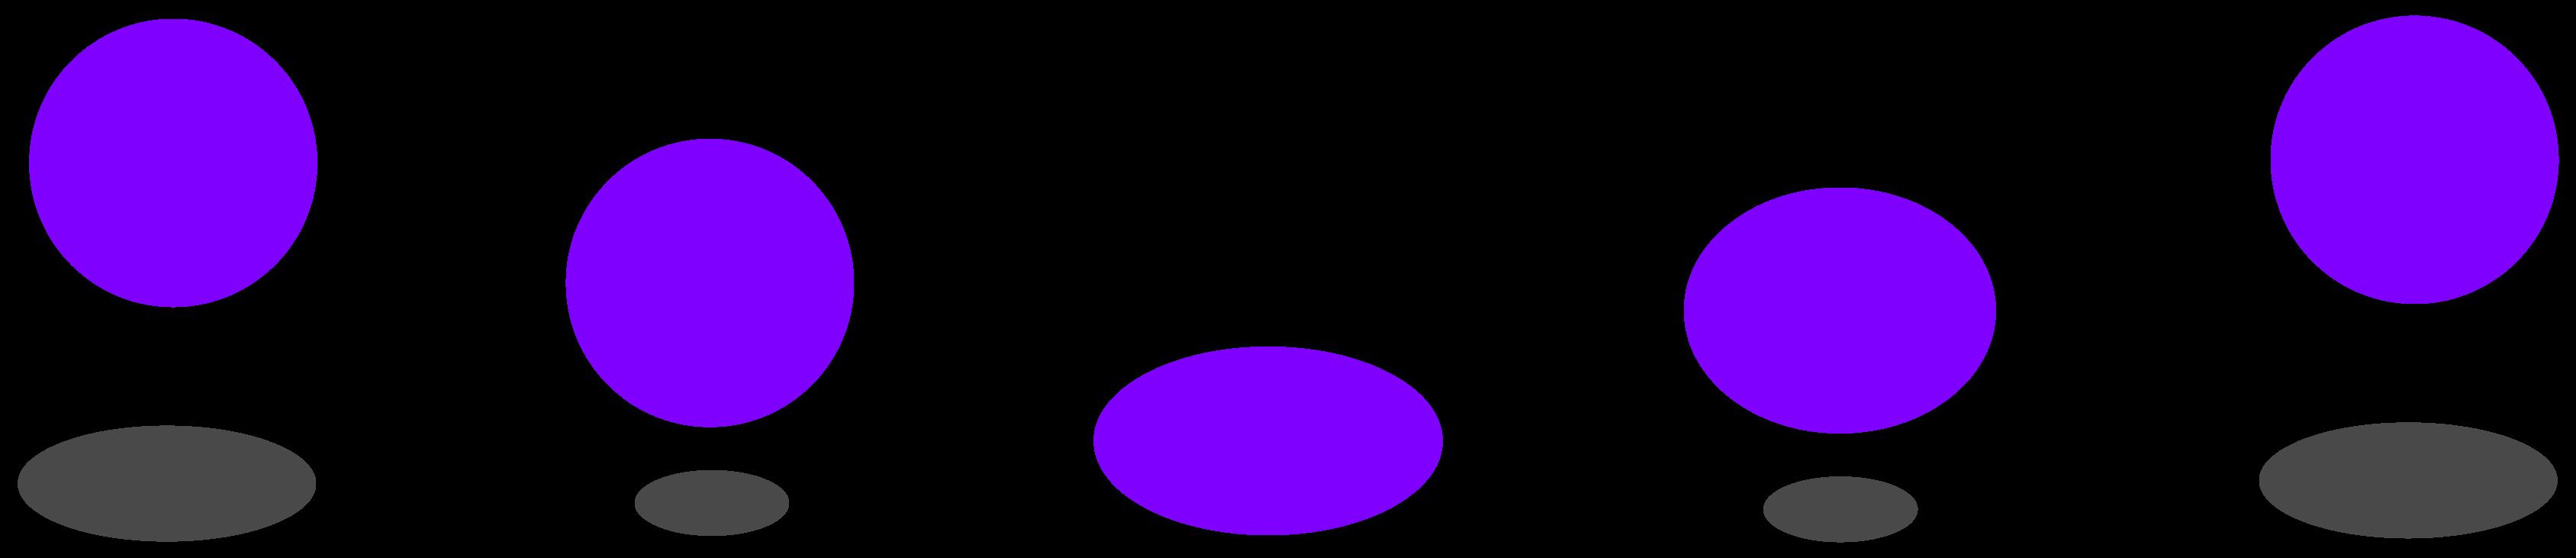 Bounce motion summary illustration